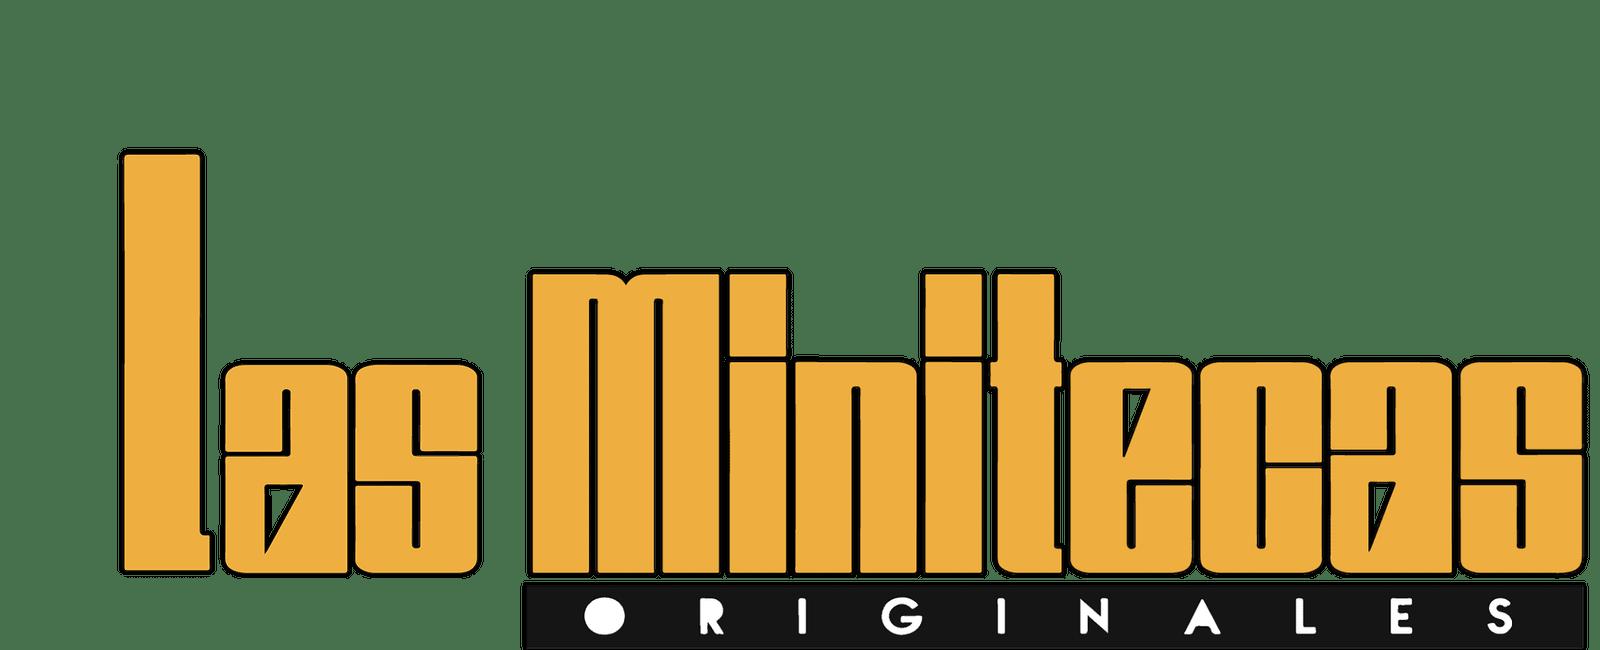 Las Minitecas Originales